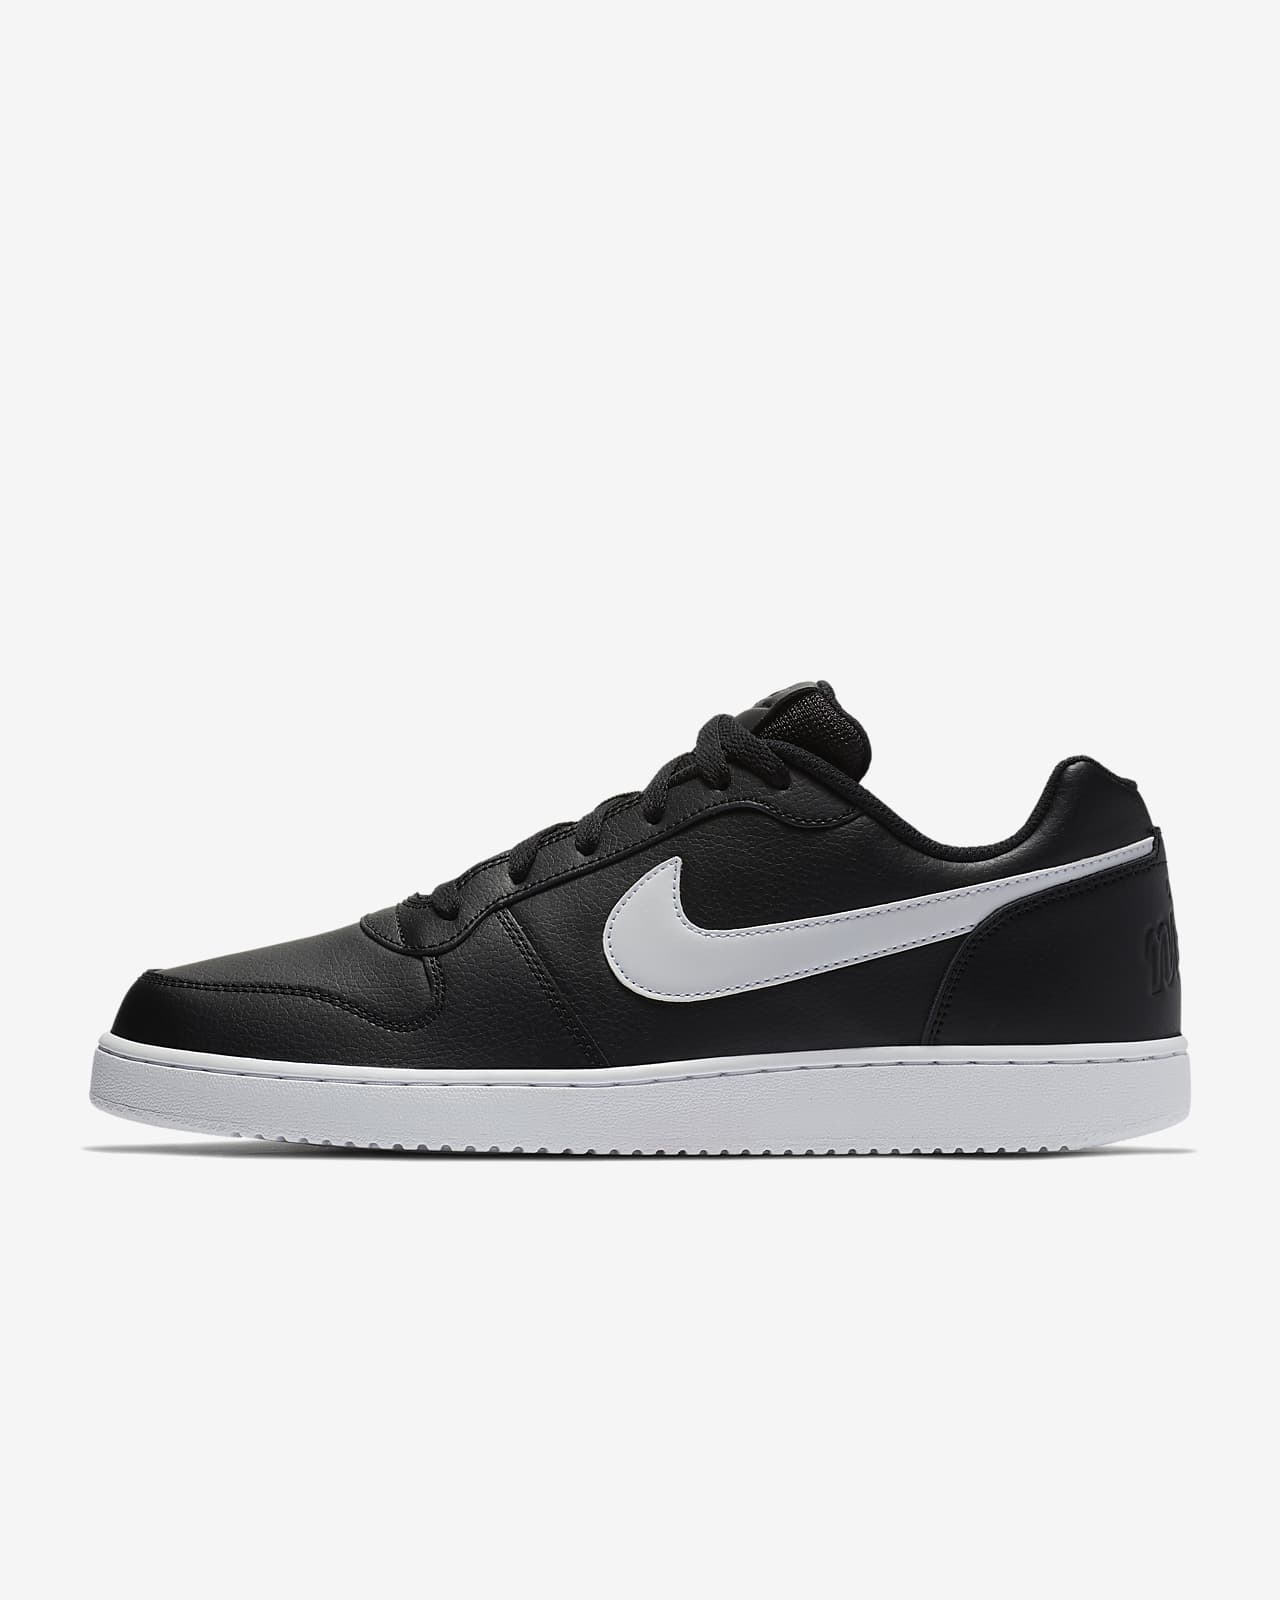 Мужские кроссовки Nike Ebernon Low. Nike RU